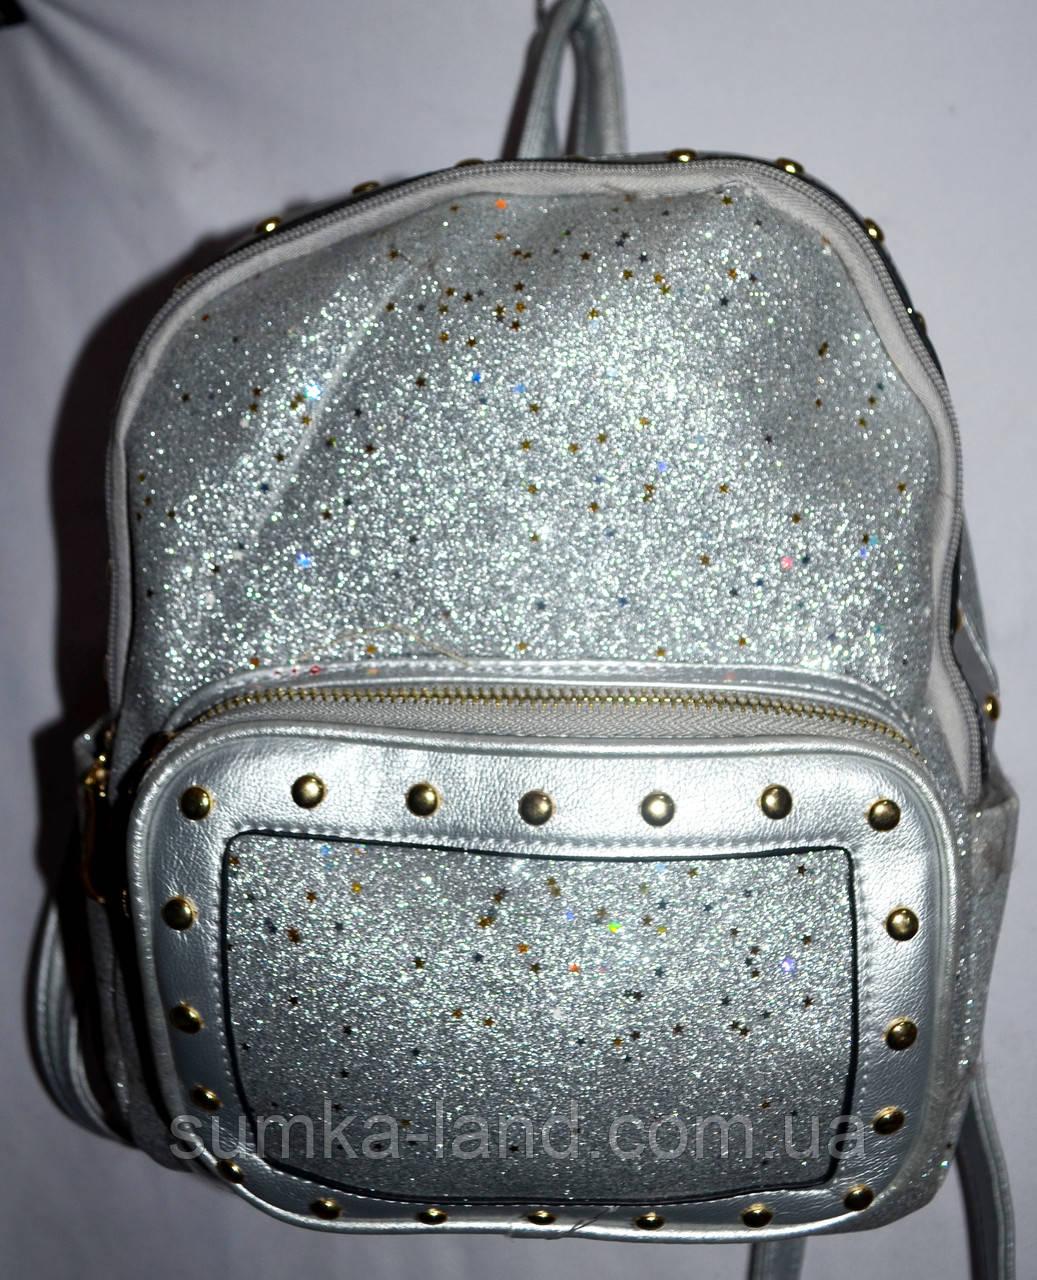 Женский рюкзак с глитером серебро 22*28 см